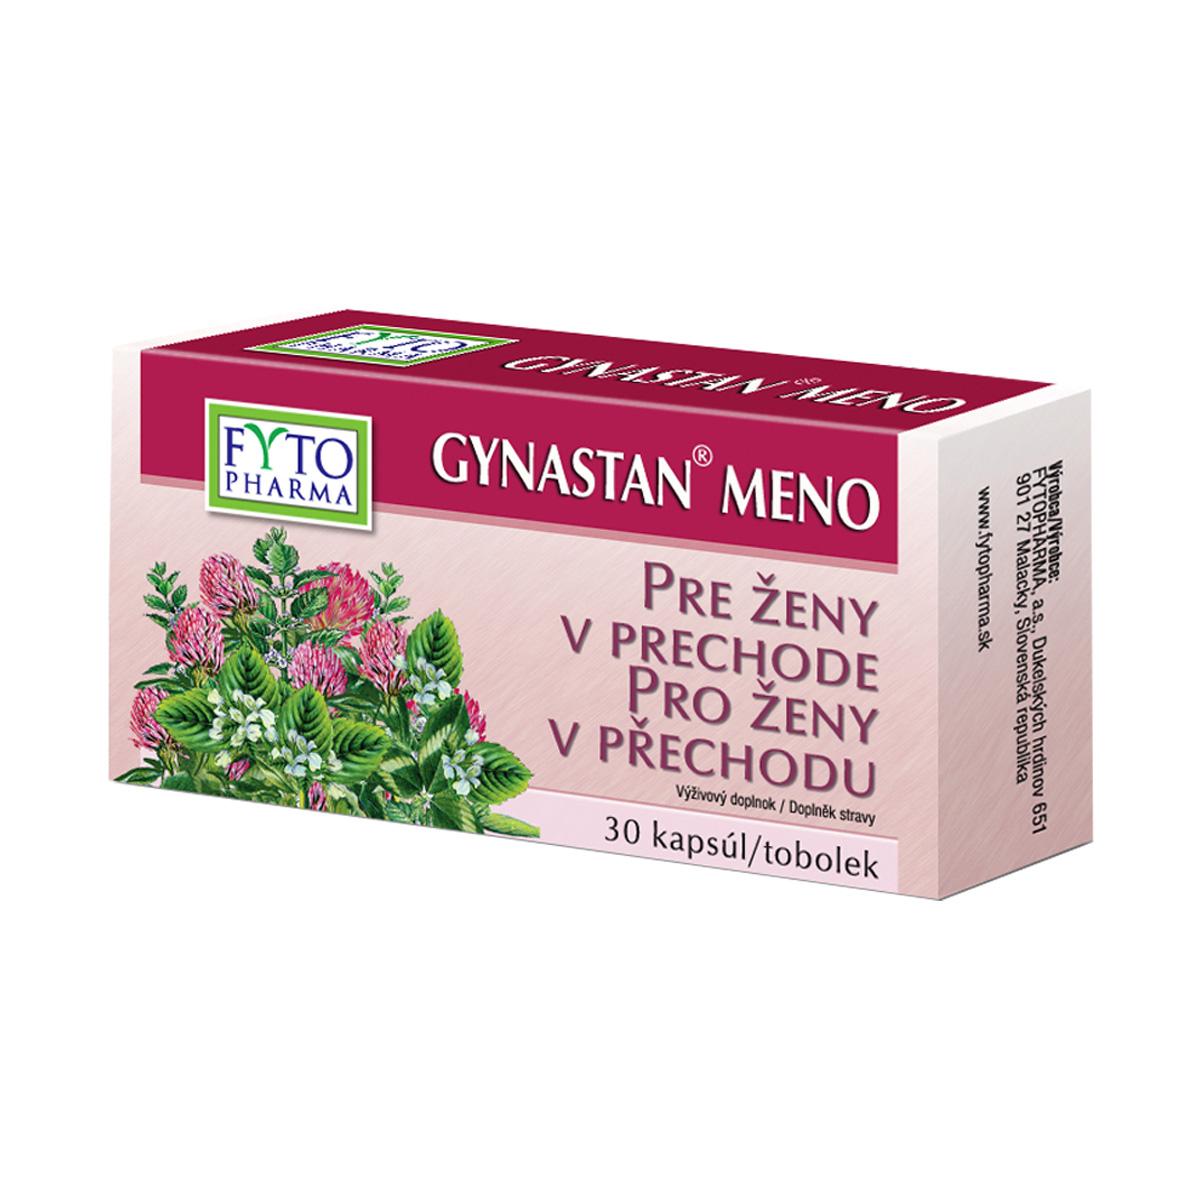 Fytopharma GYNASTAN® MENO tobolky při menopauze 30 cps